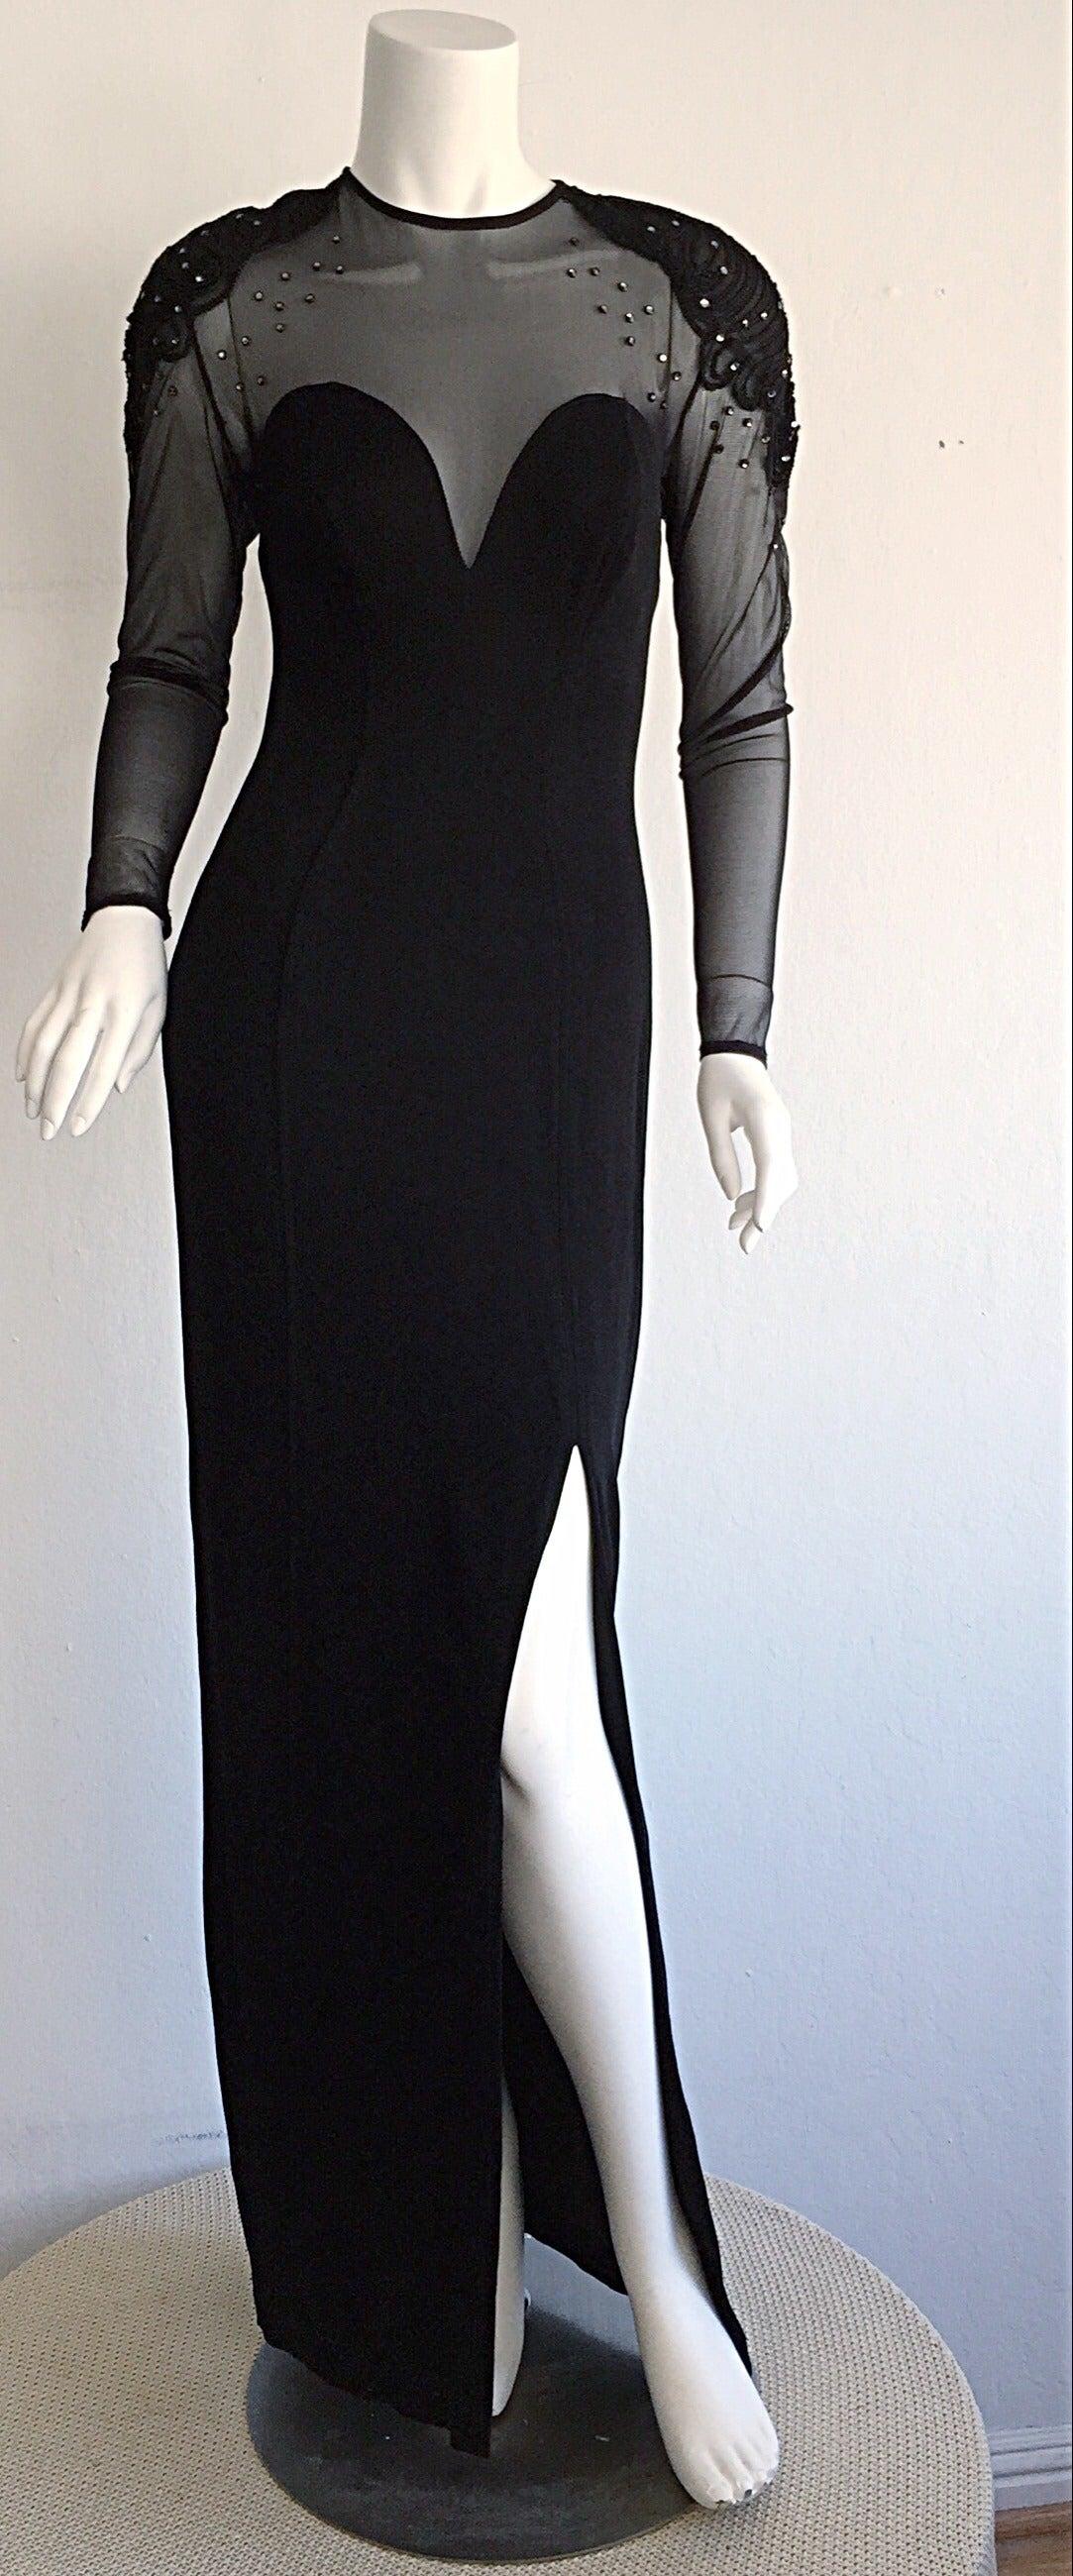 Sexy Vintage 1990s Black Cut - Out Bodycon Dress w/ Rhinestones 9